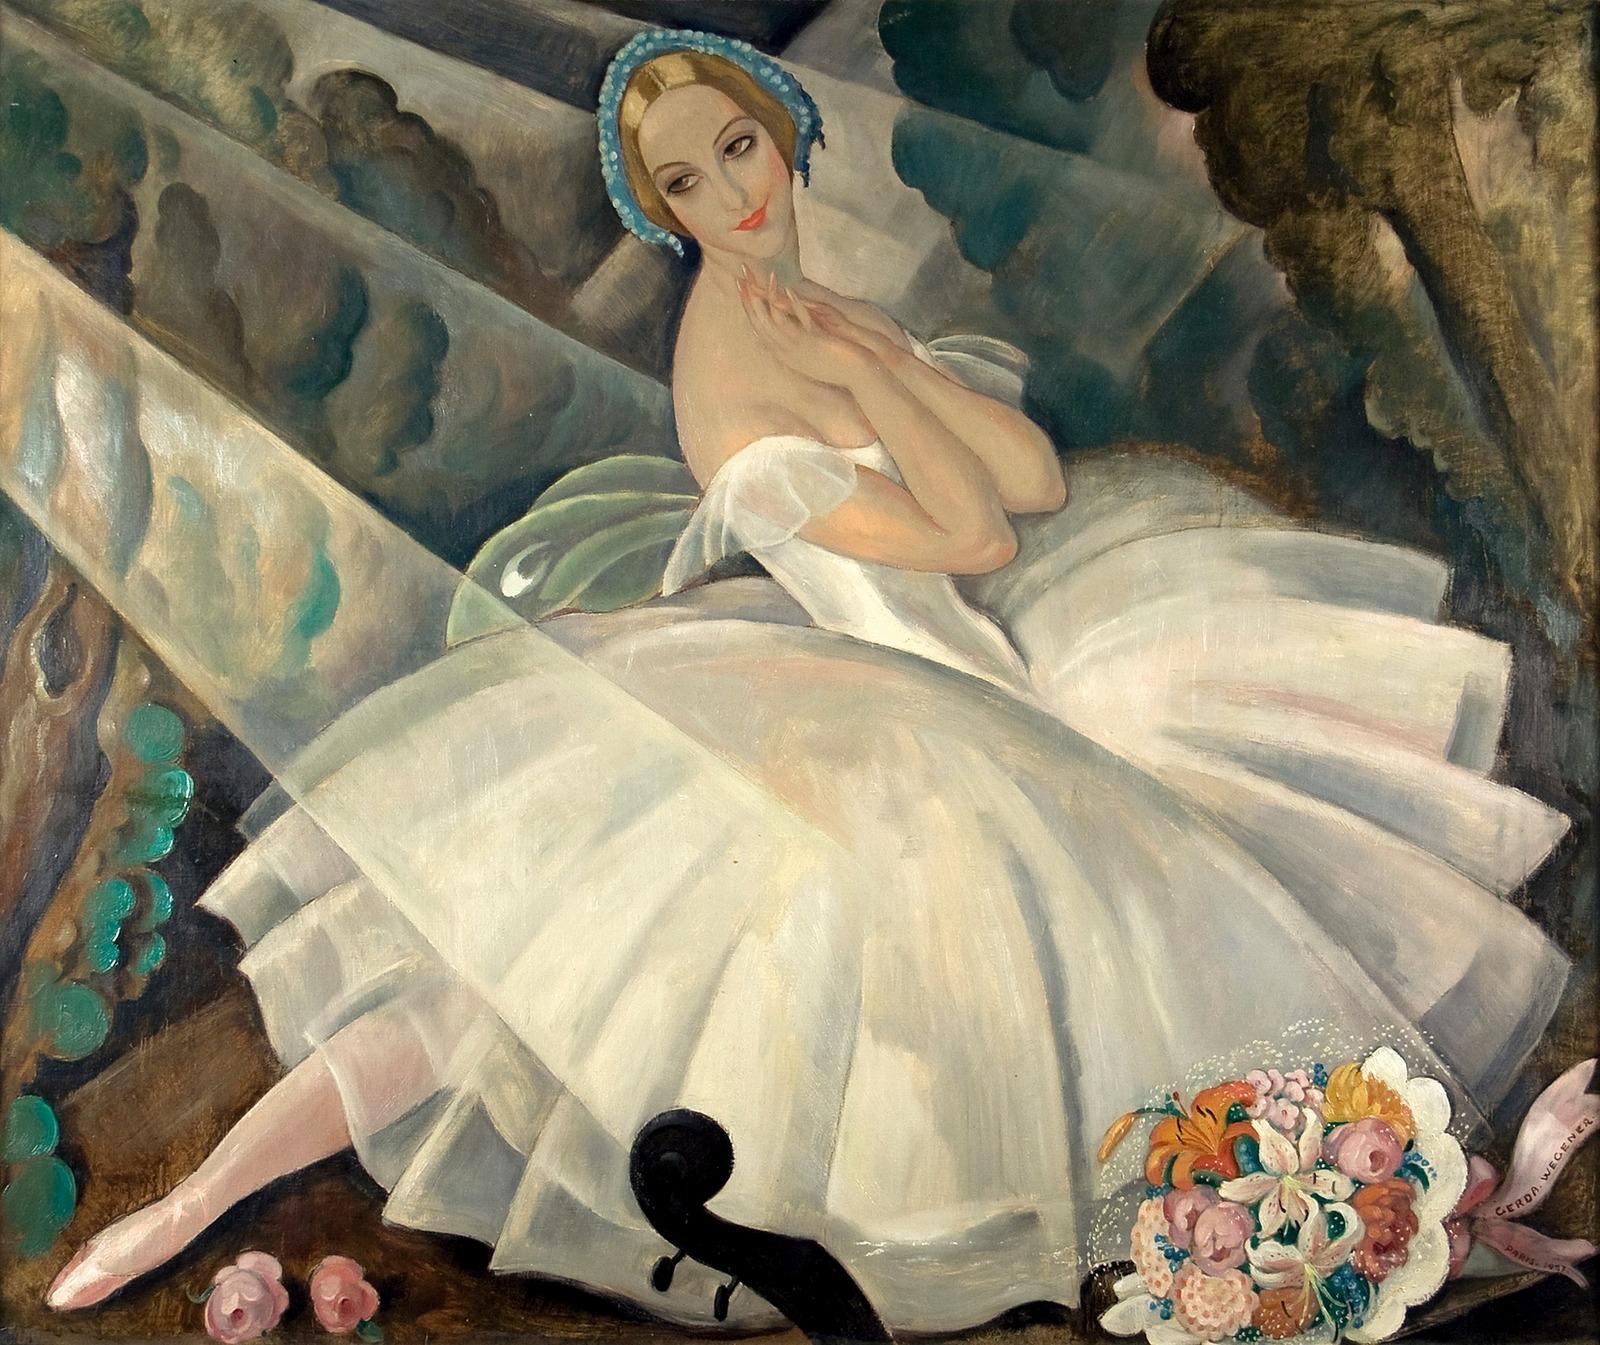 1_1927_Балерина Улла Поульсен в балете «Шопениана», Париж (The Ballerina Ulla Poulsen in the Ballet Chopiniana, Paris)_х.,м._Копенгаген, Театральный музей в Дворцовом театре.jpg